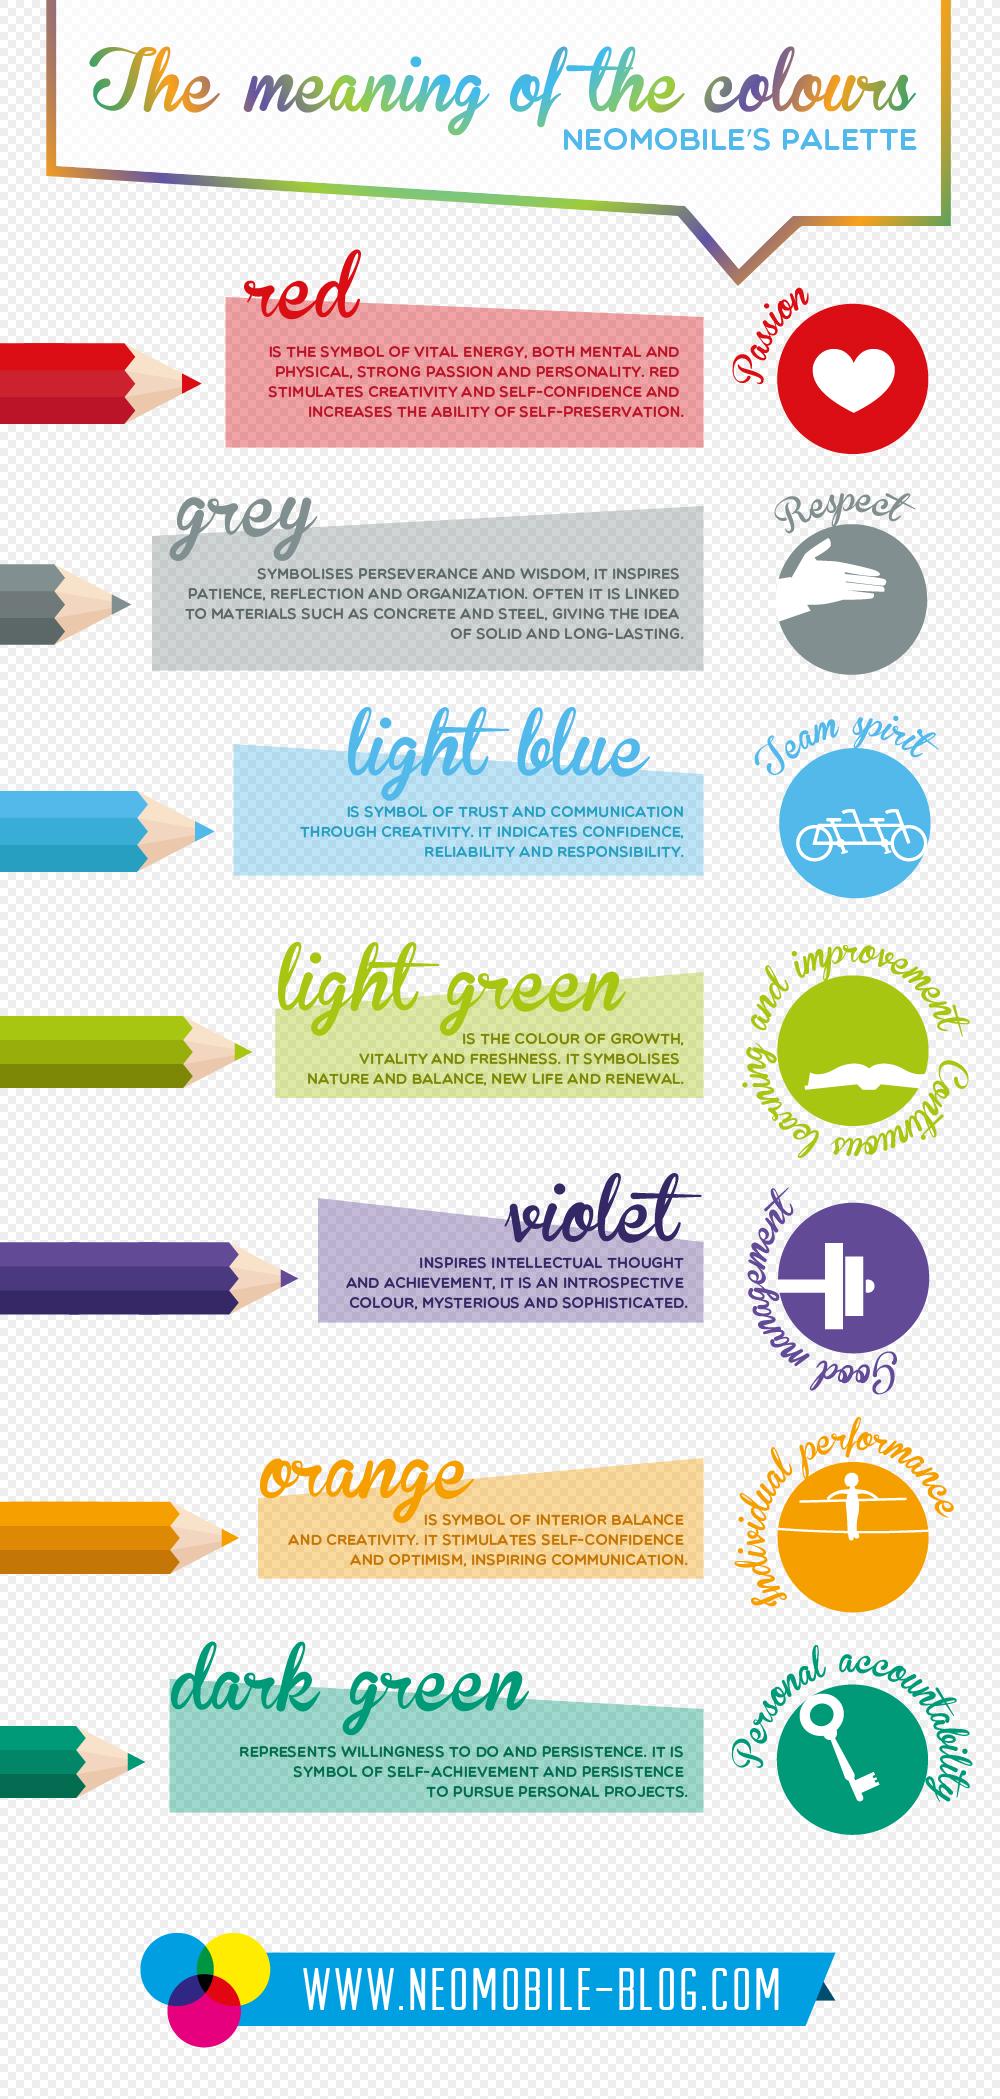 Colors-in-web-design